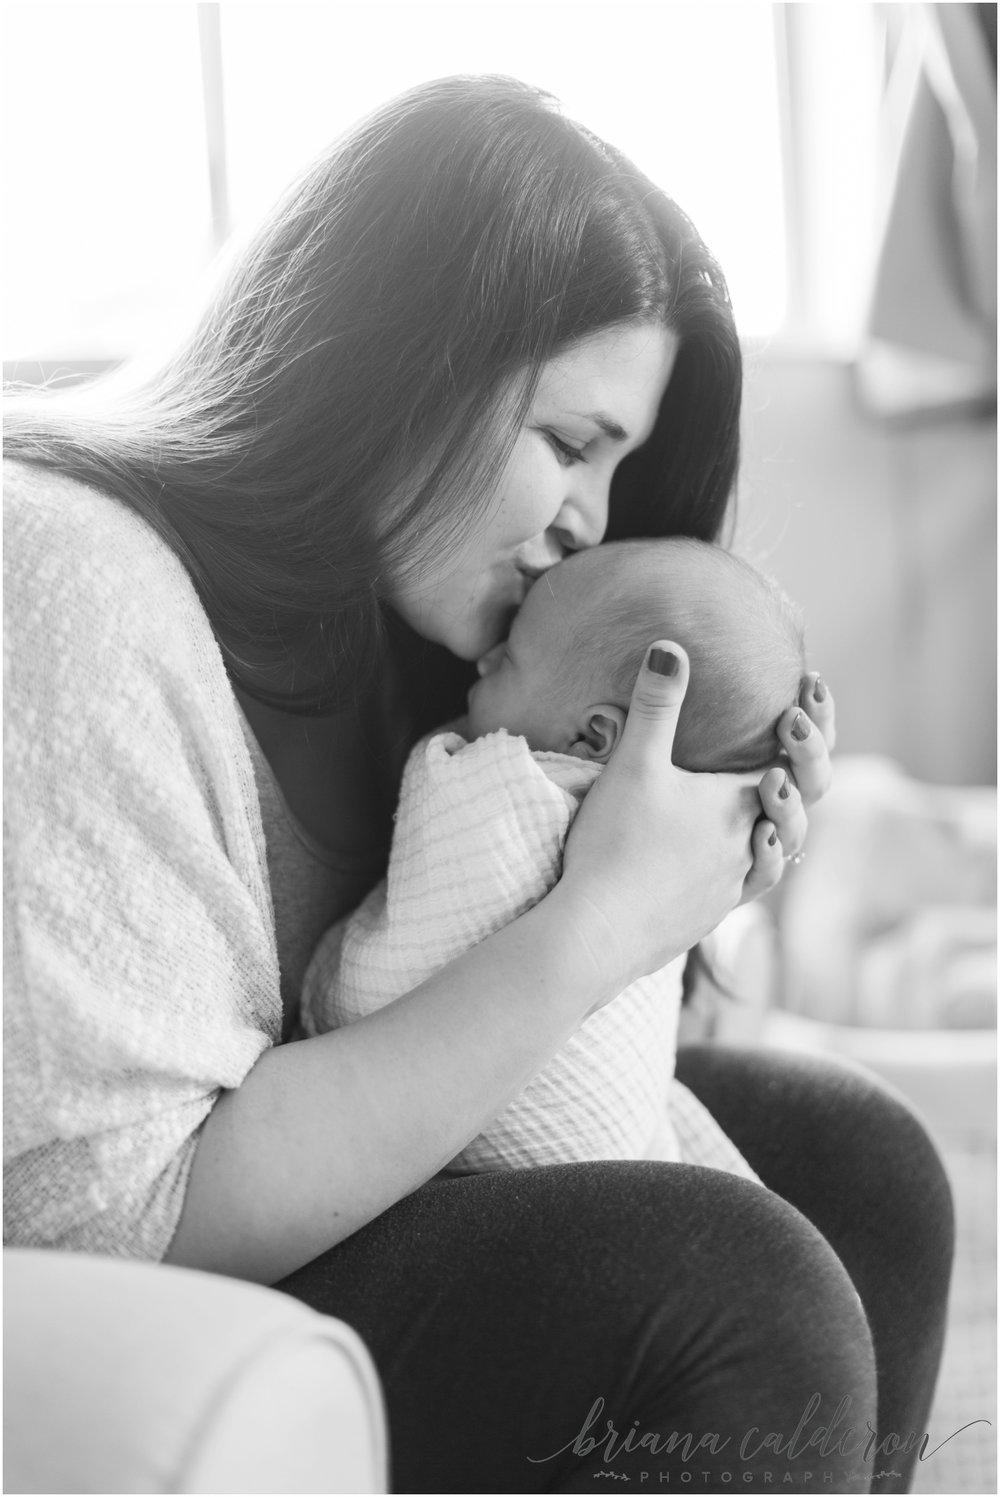 Lifestyle newborn photos by Briana Calderon Photography_0982.jpg